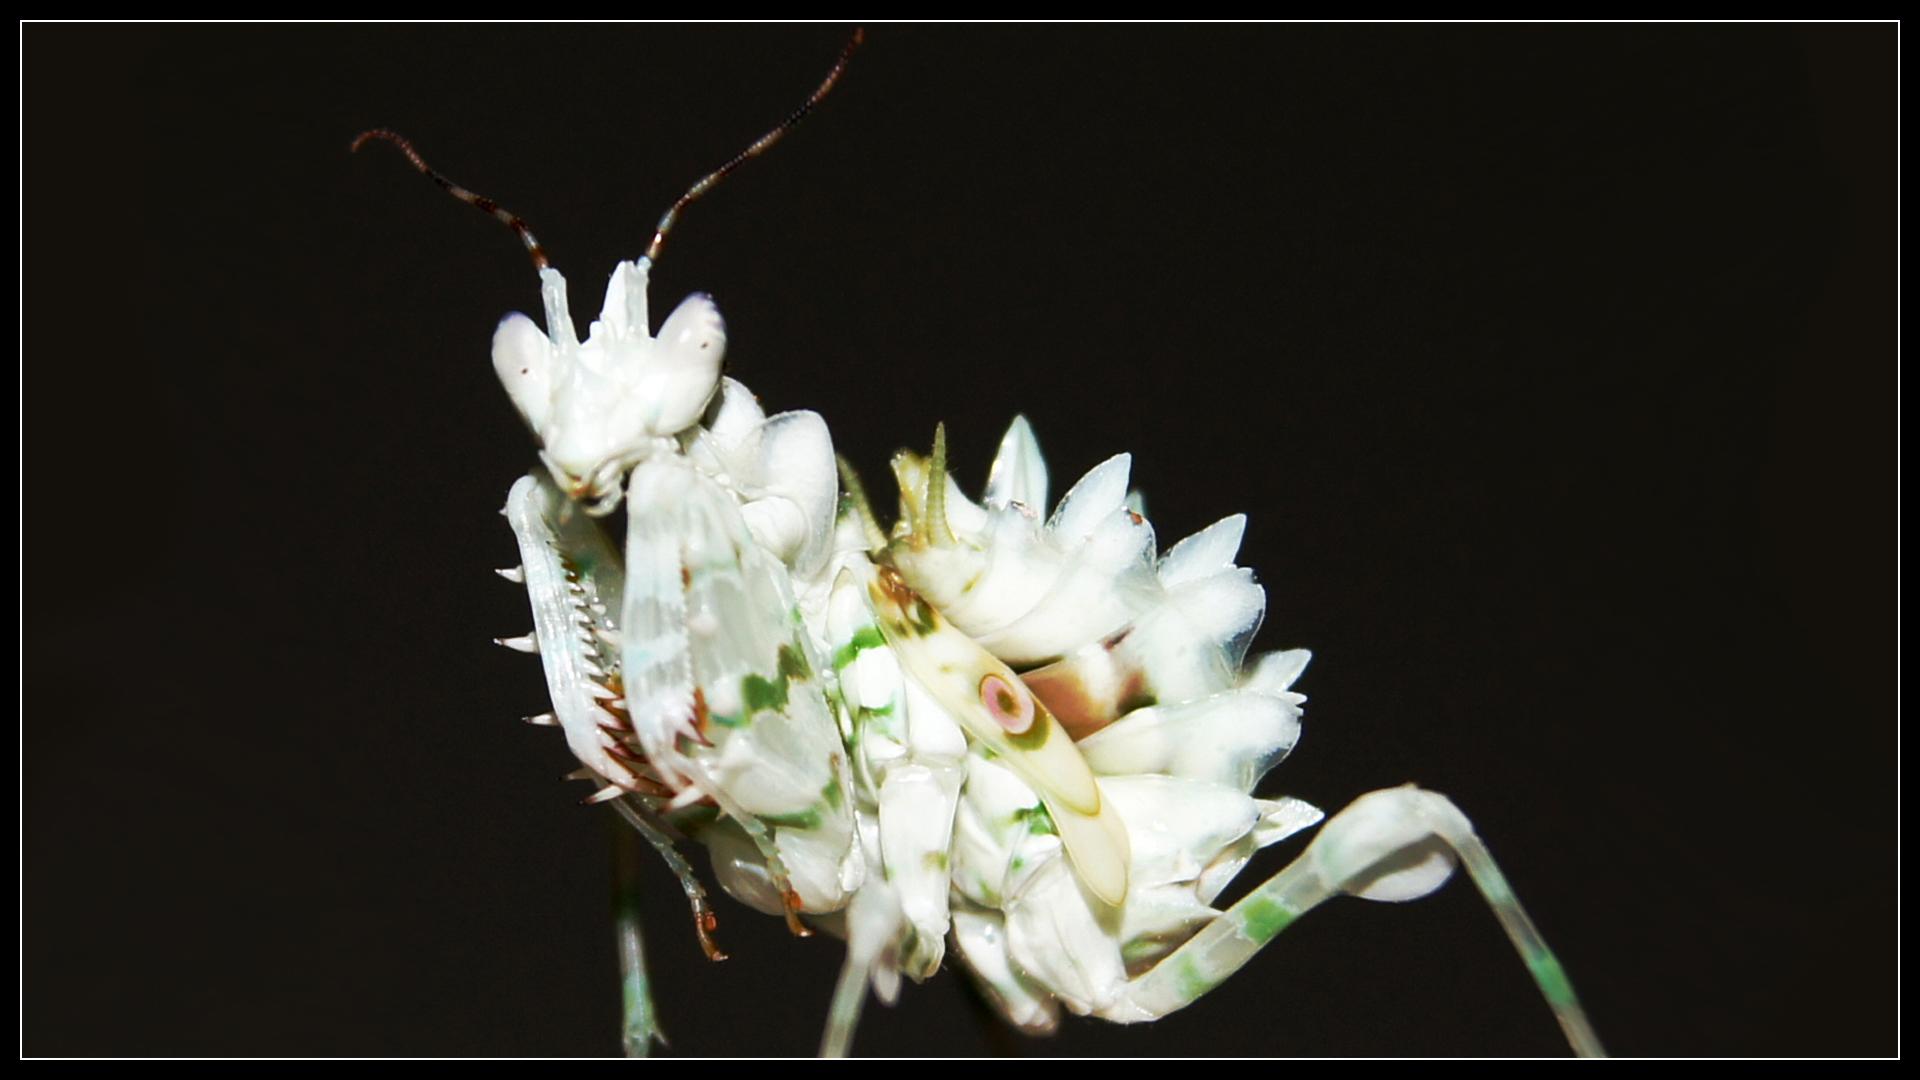 Pseudocreobotra wahlbergii L5 by Cerebrum-Vortex